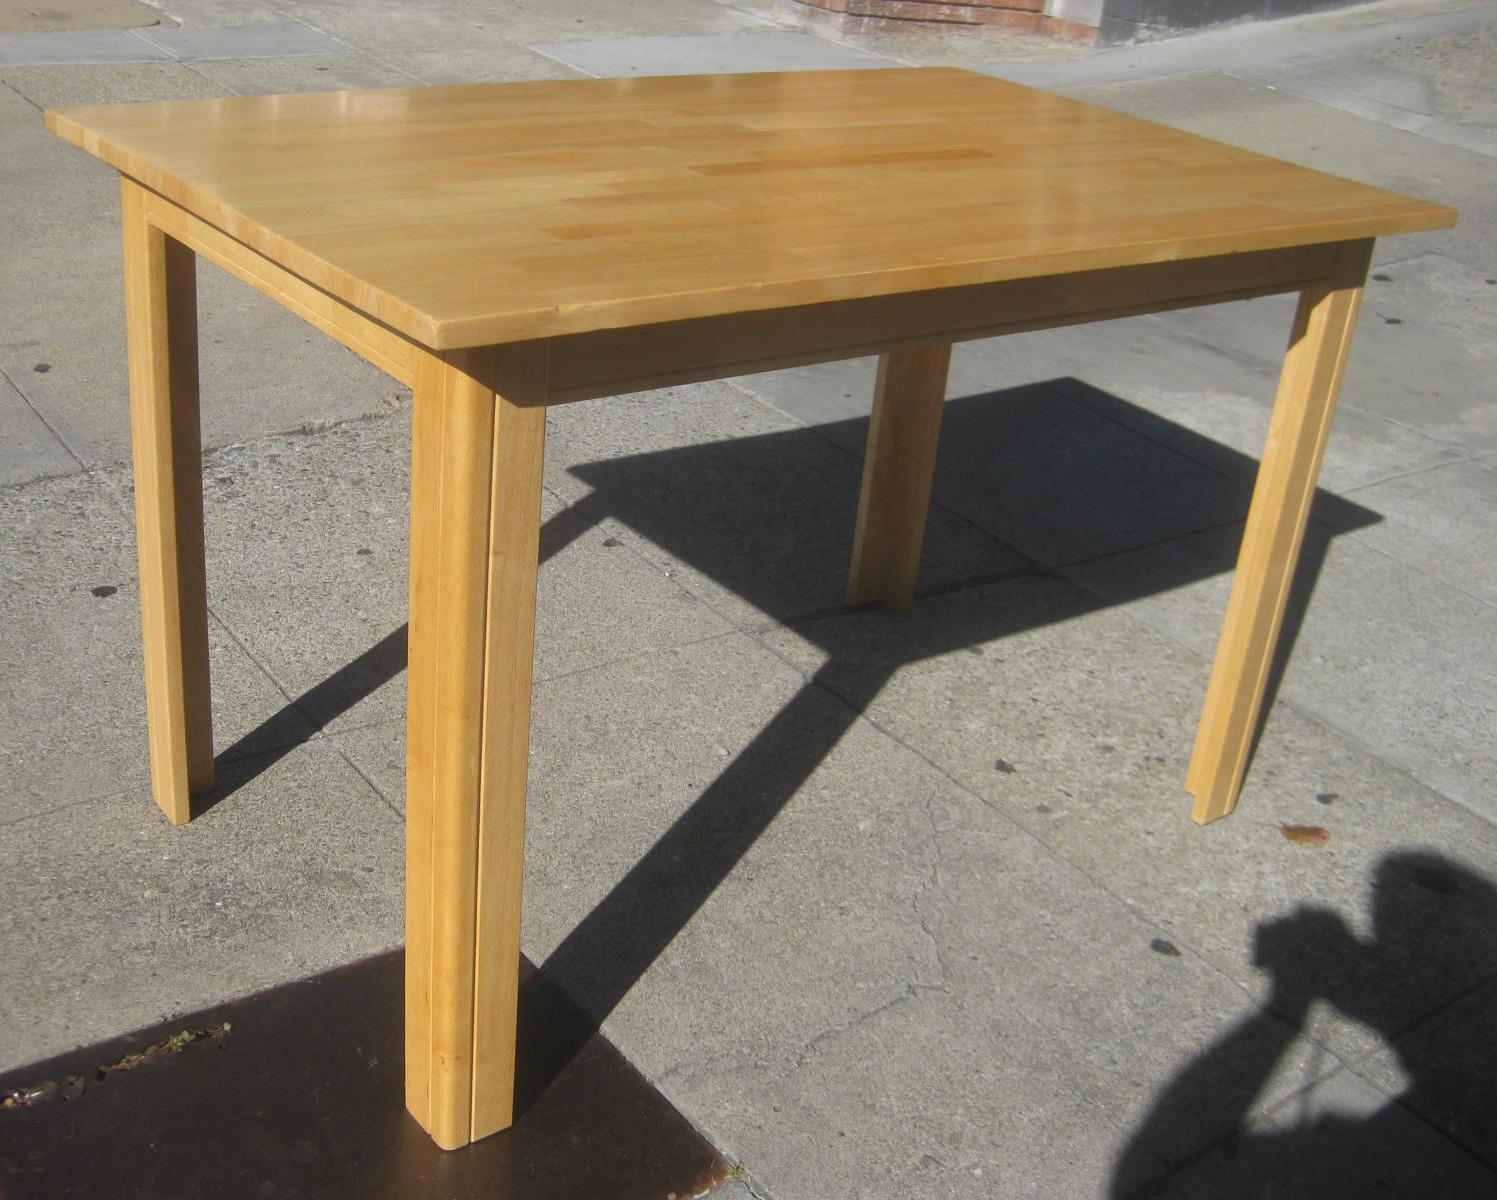 uhuru furniture & collectibles: sold - butcher block